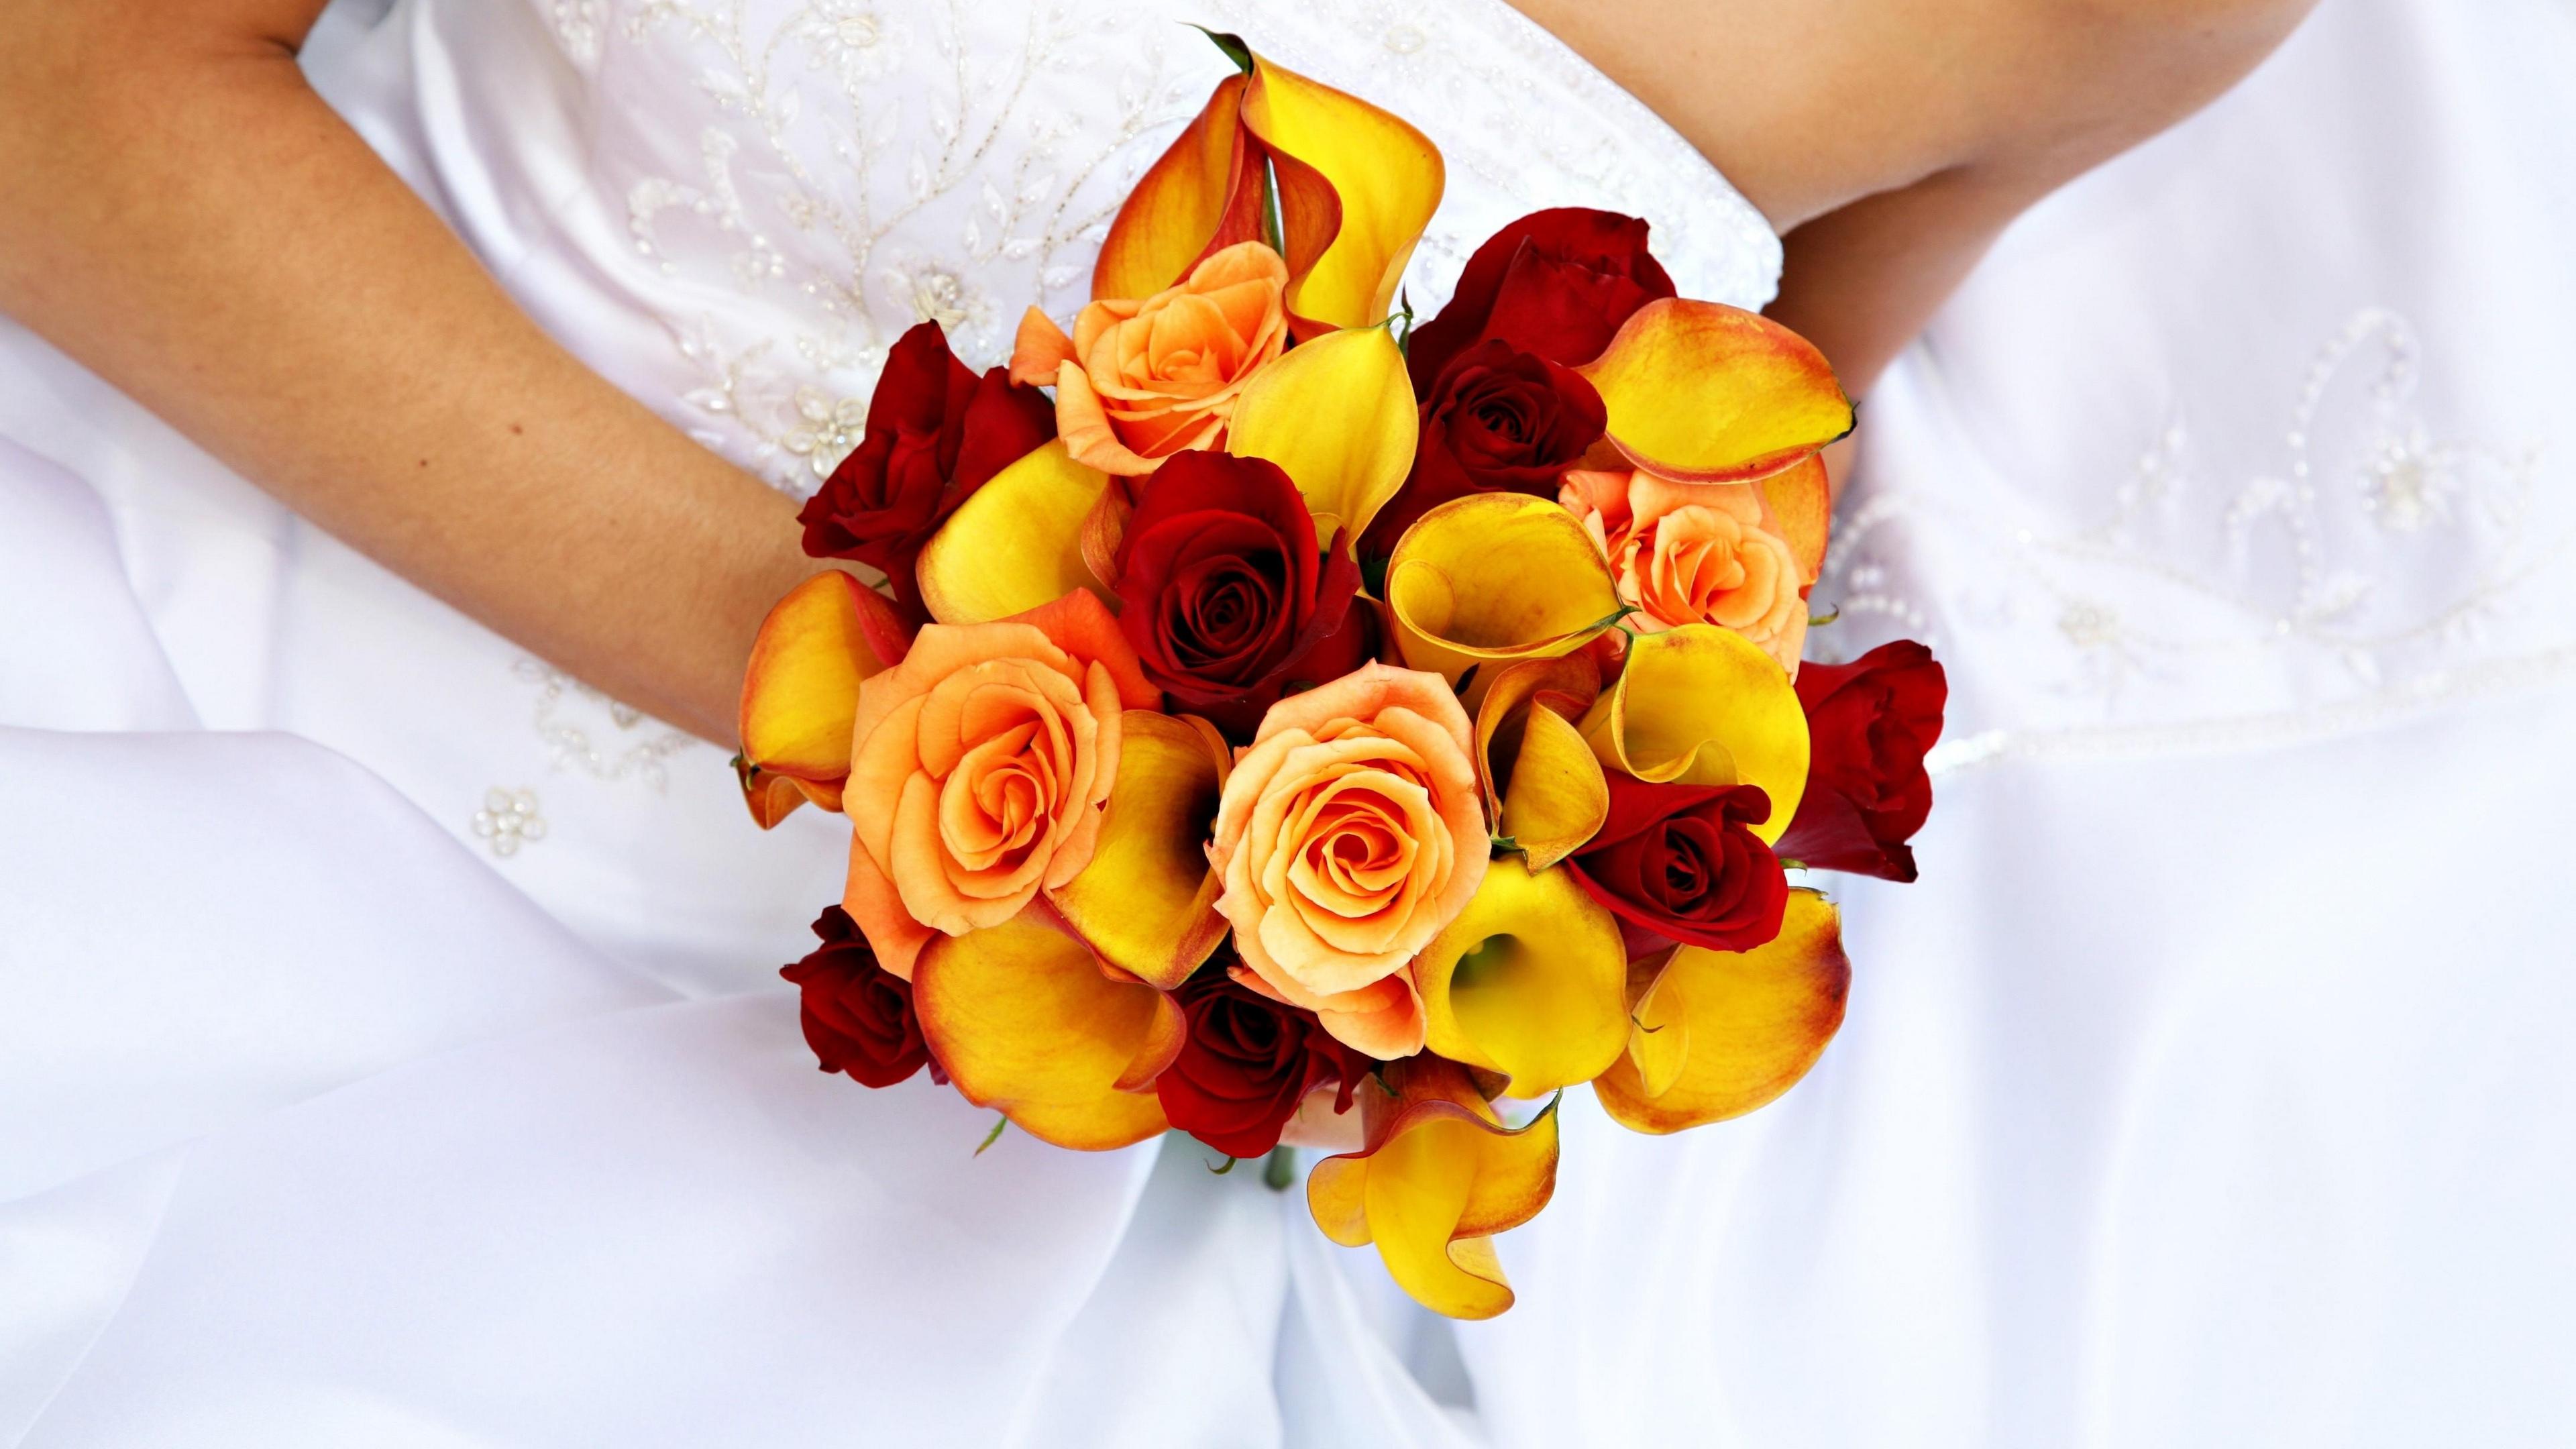 roses calla lilies bridal bouquet groom dress 4k 1540064189 - roses, calla lilies, bridal bouquet, groom, dress 4k - Roses, calla lilies, bridal bouquet